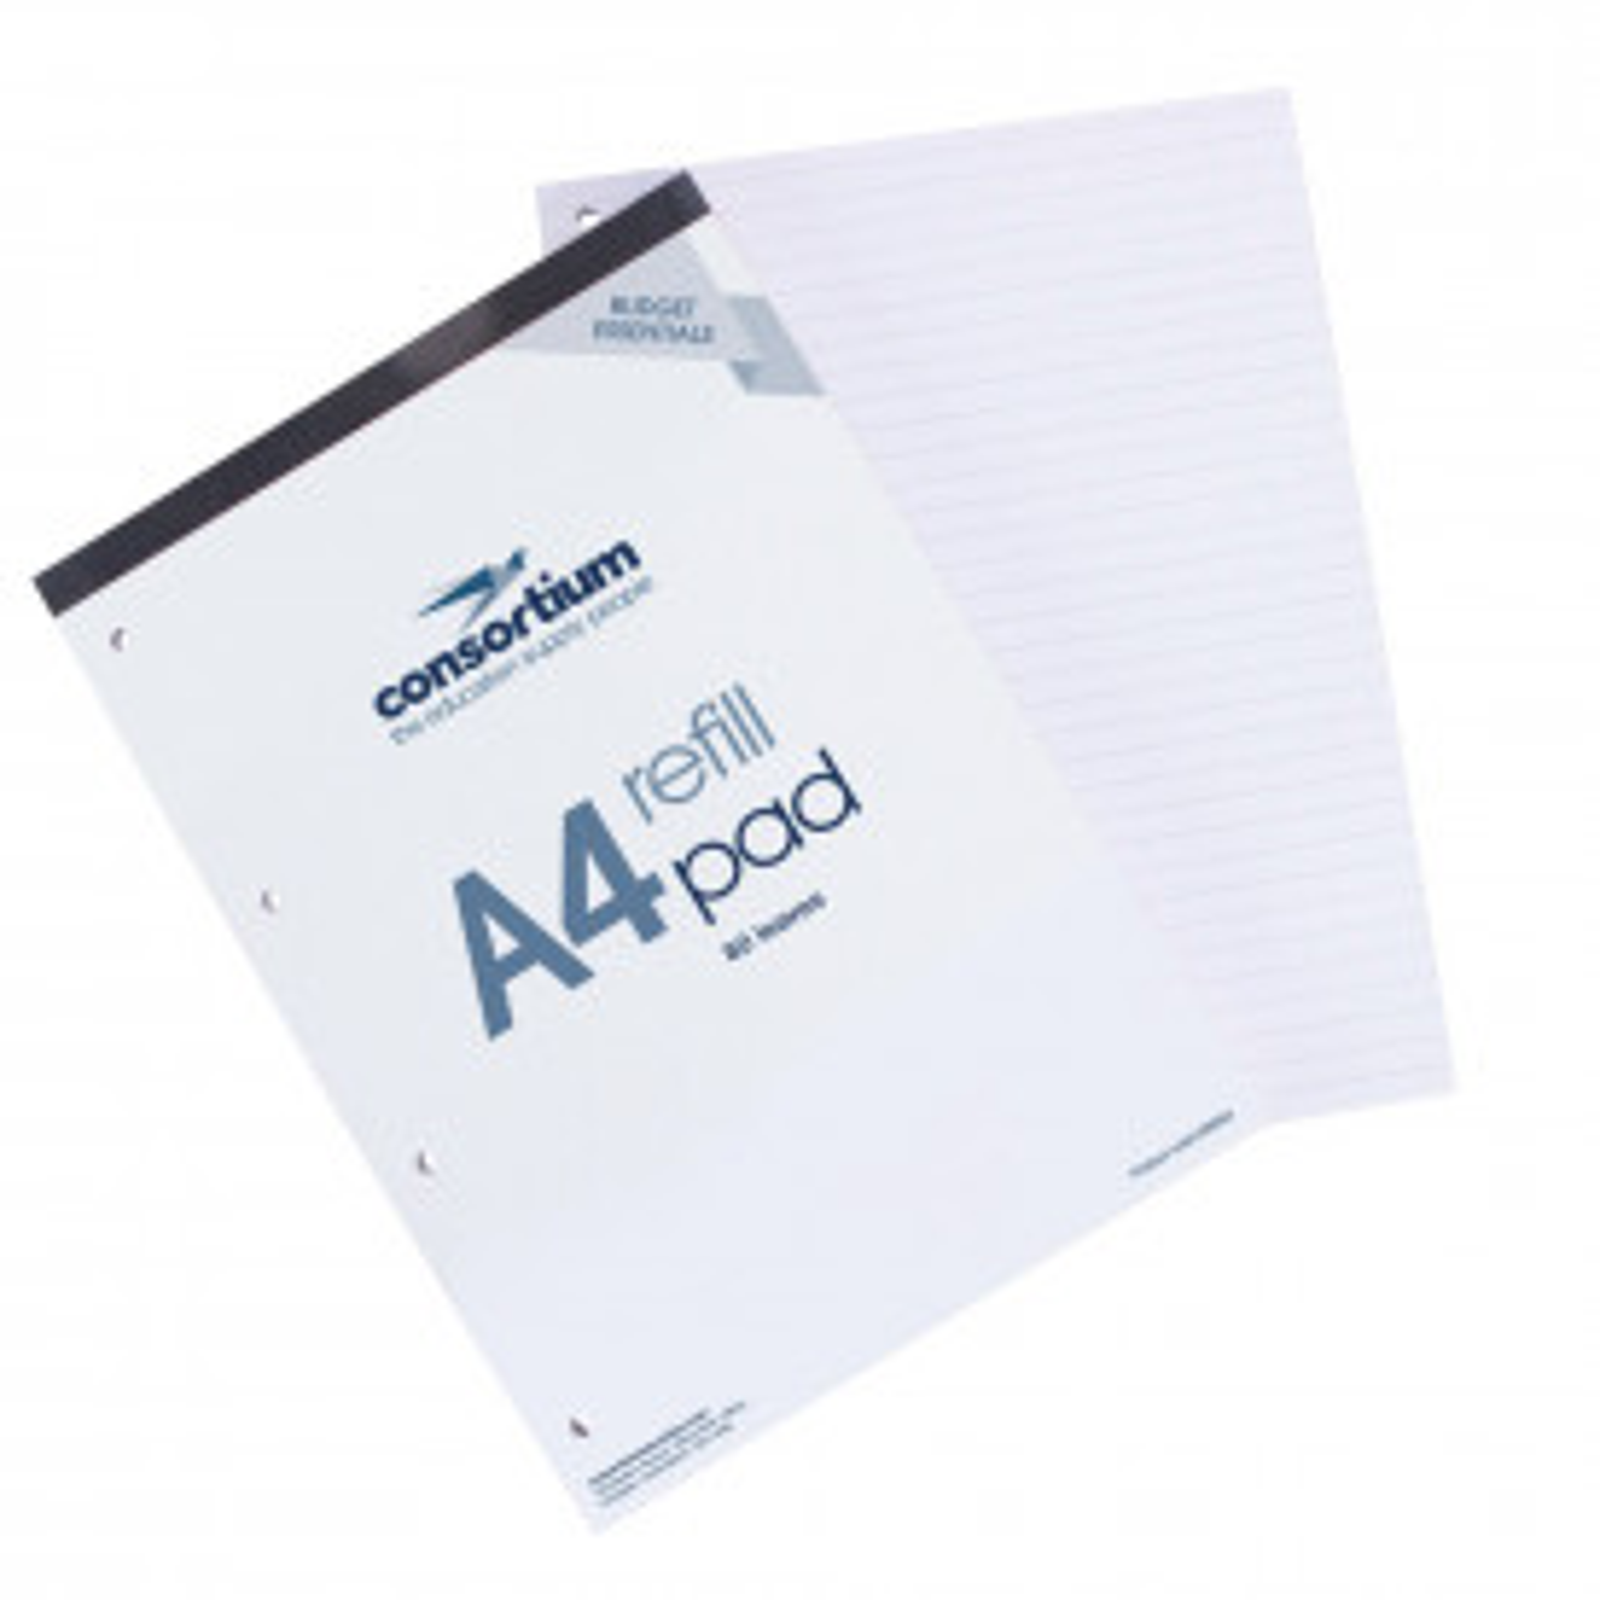 Budget Essentials A4 Headbound Refill Pads